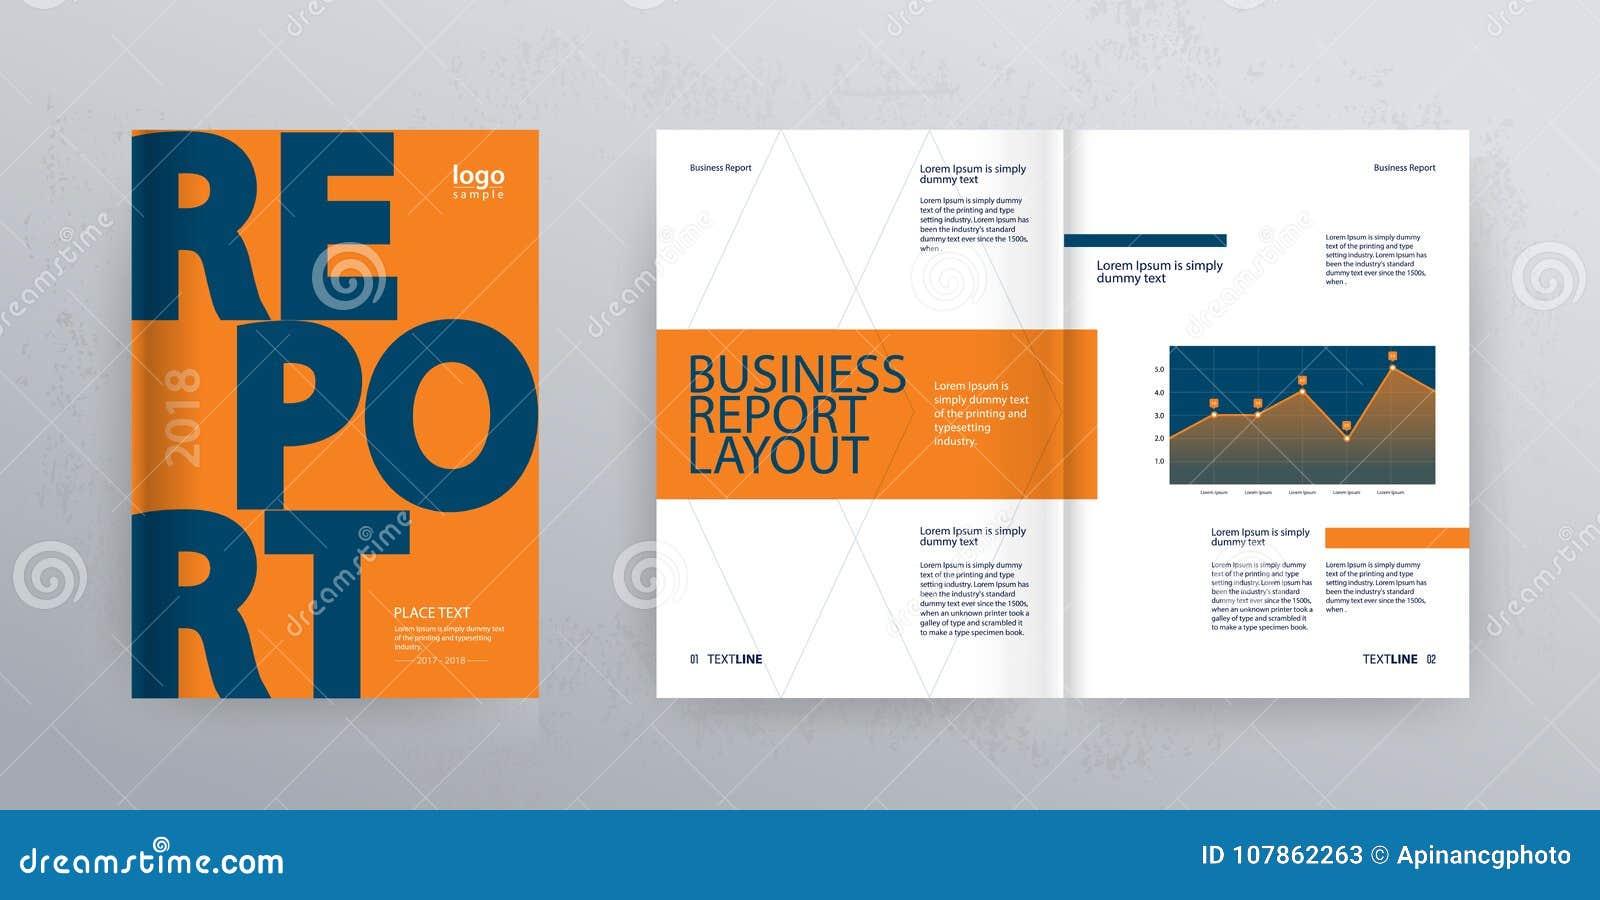 company profile design layout vectors